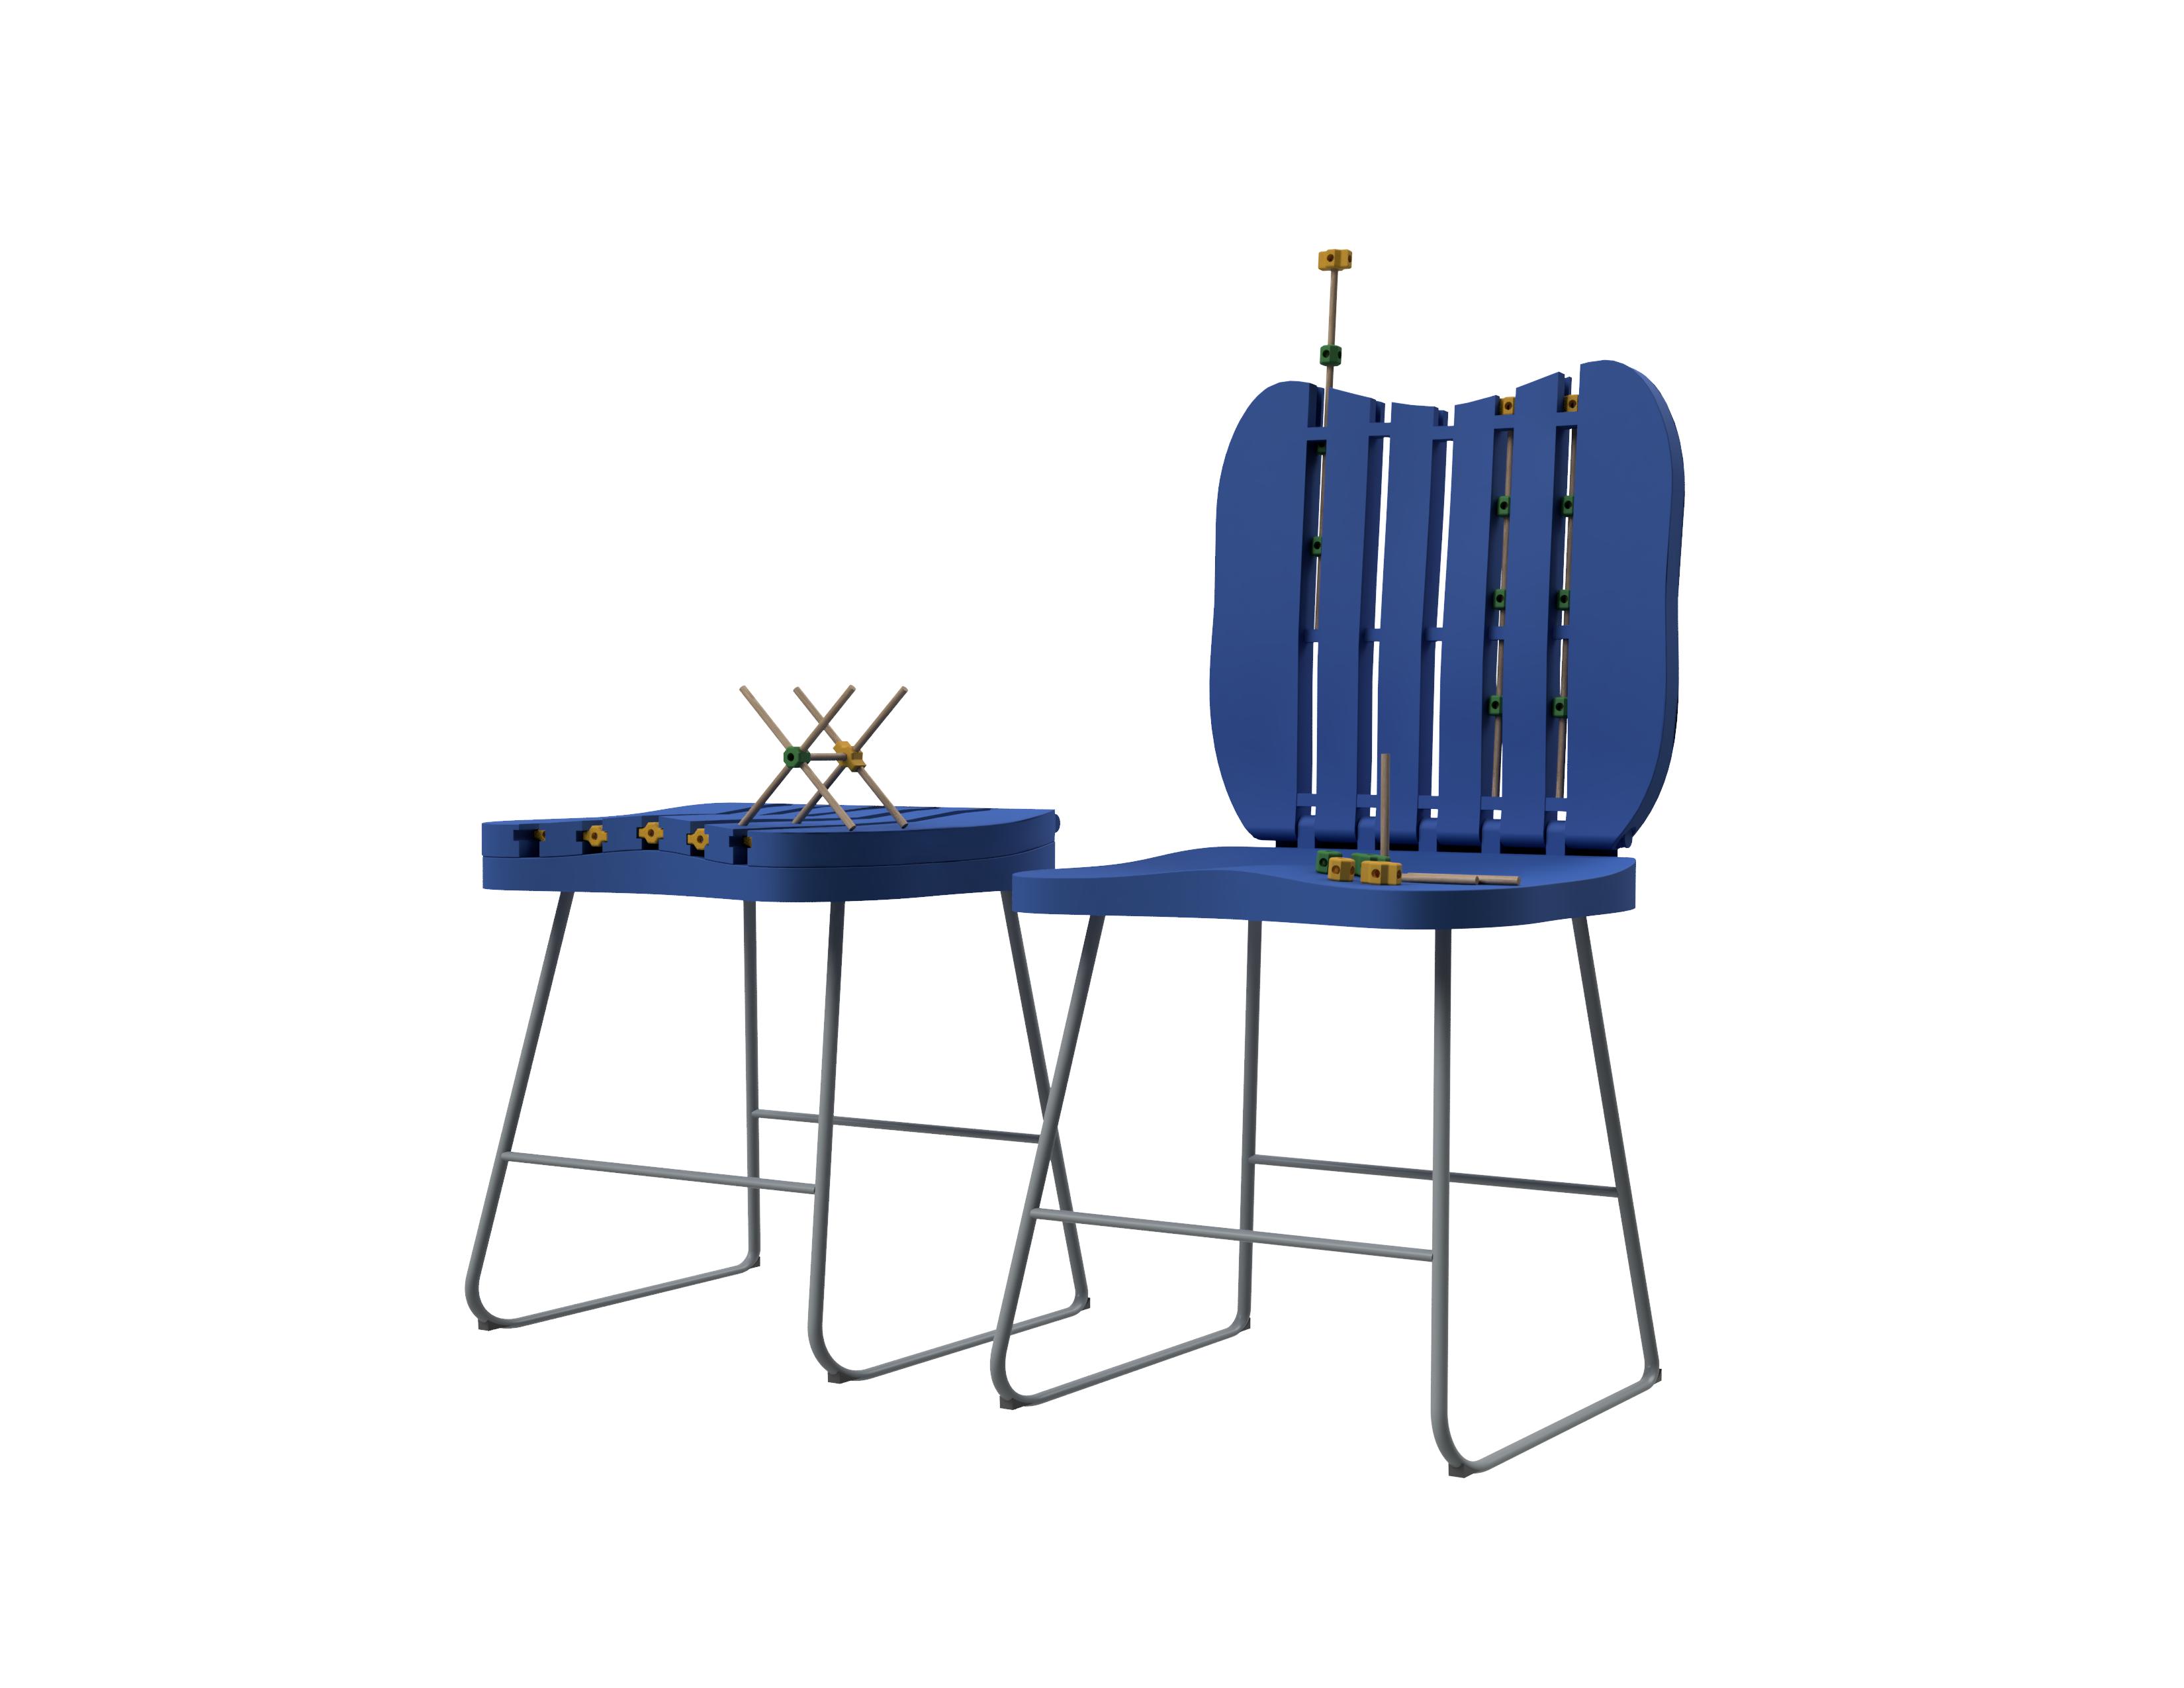 SPARKS - Innovative Educational Furniture